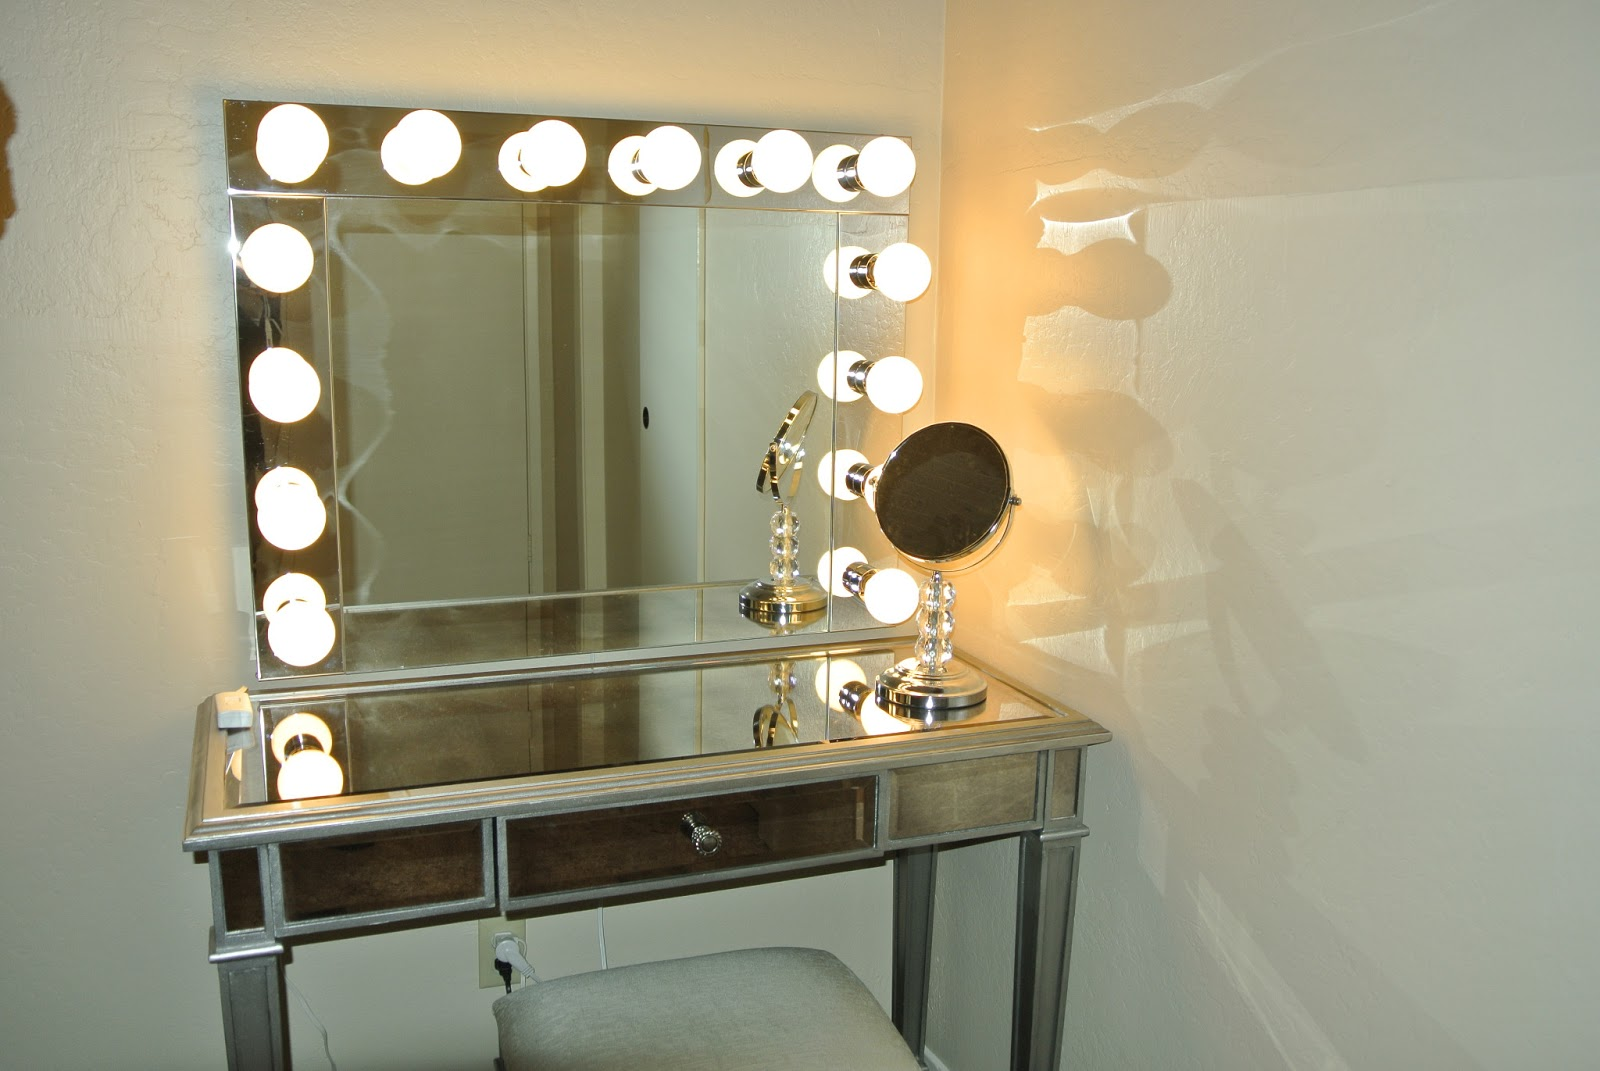 Зеркало для визажиста с подсветкой своими руками